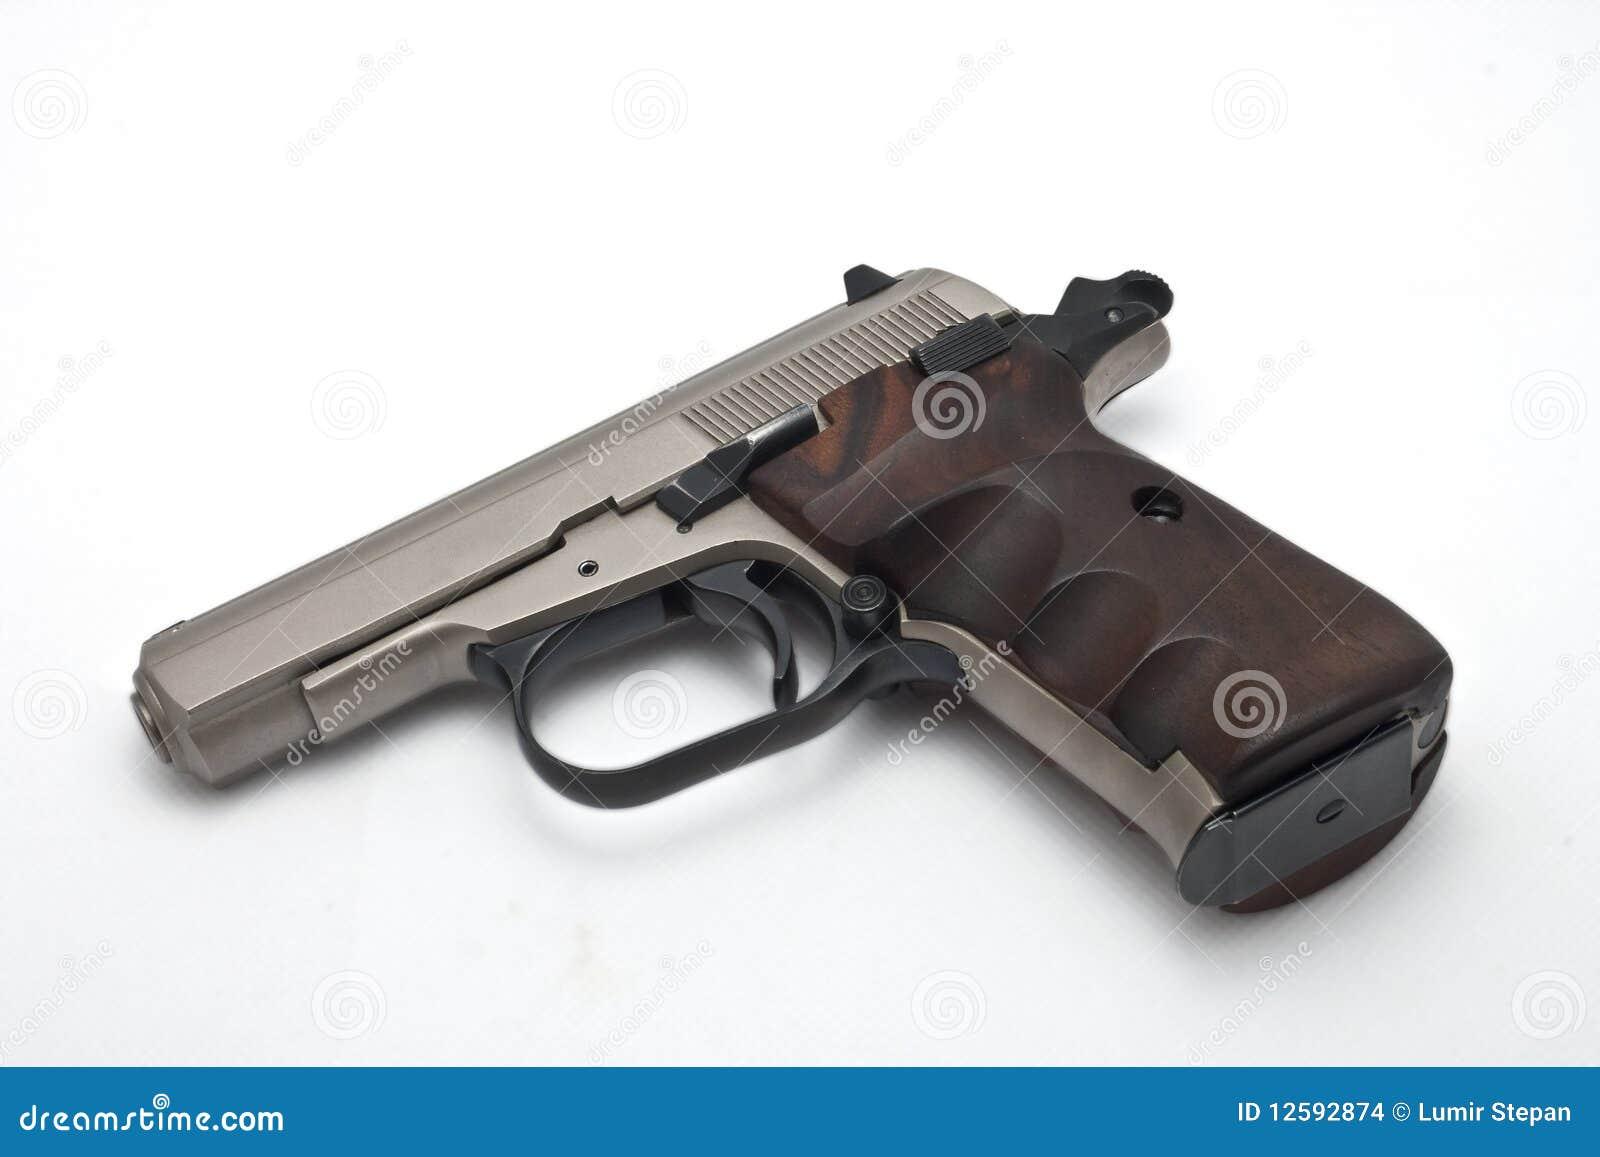 gun white background - photo #23